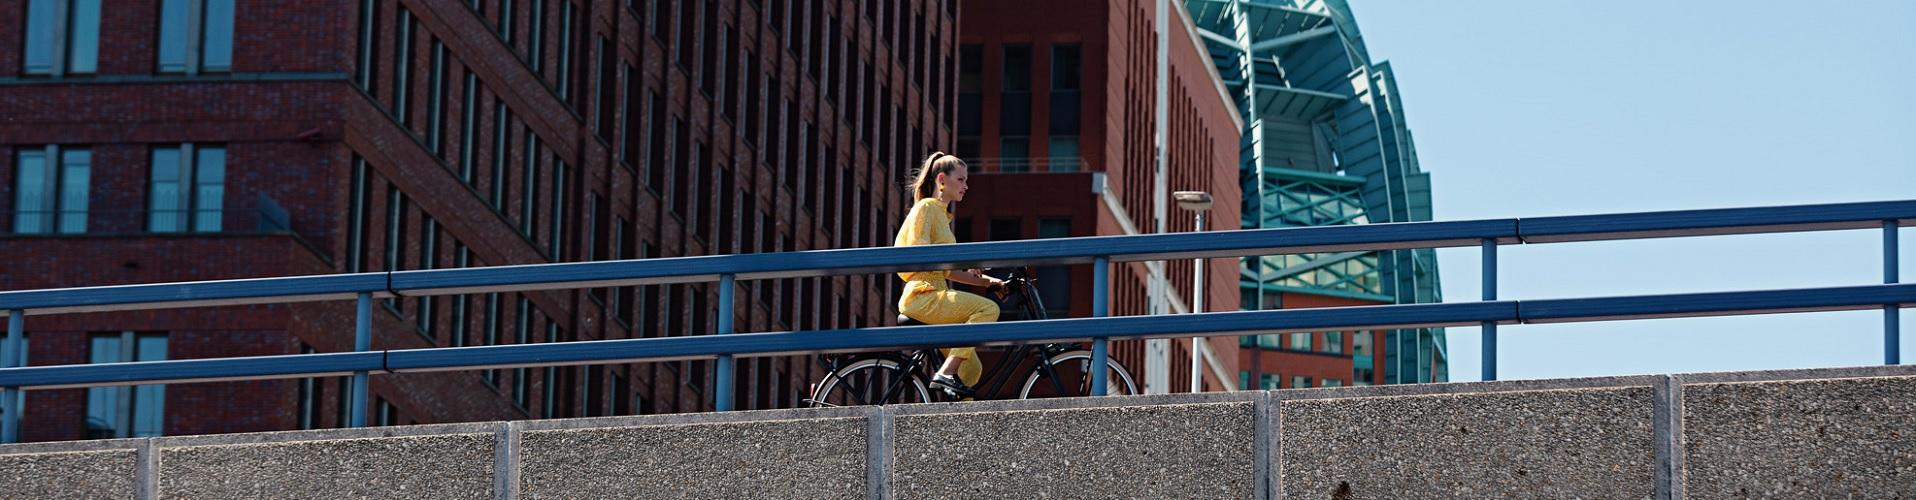 Consumentenbond E-bike Test resultaten